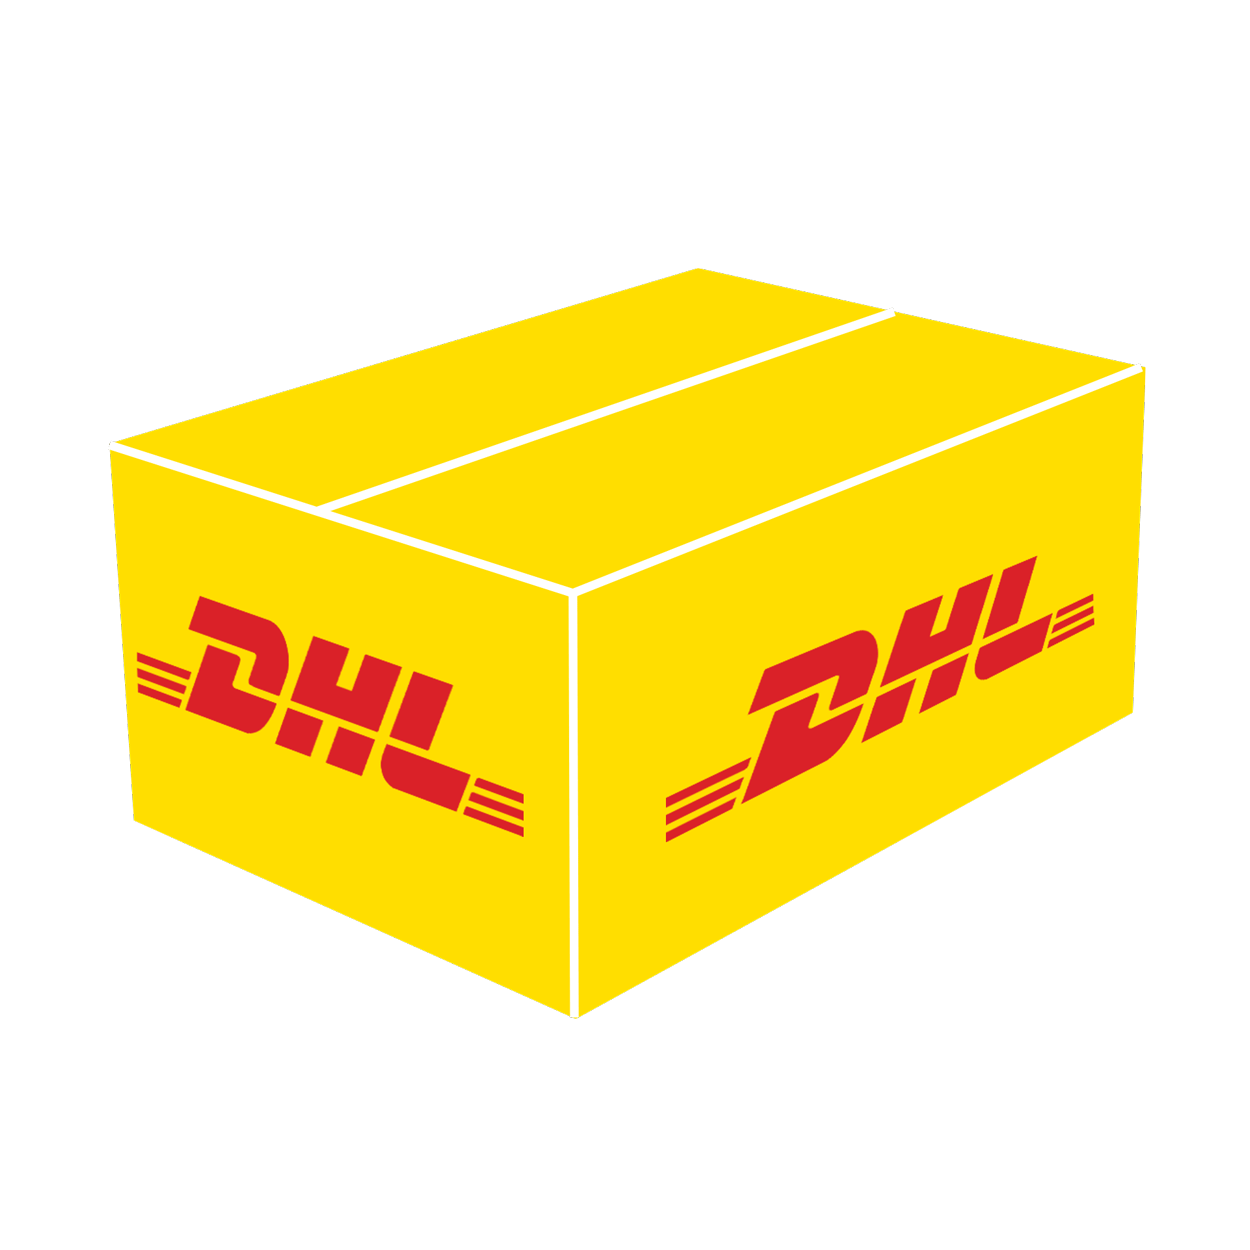 kartons für den dhl versand | onlinepack